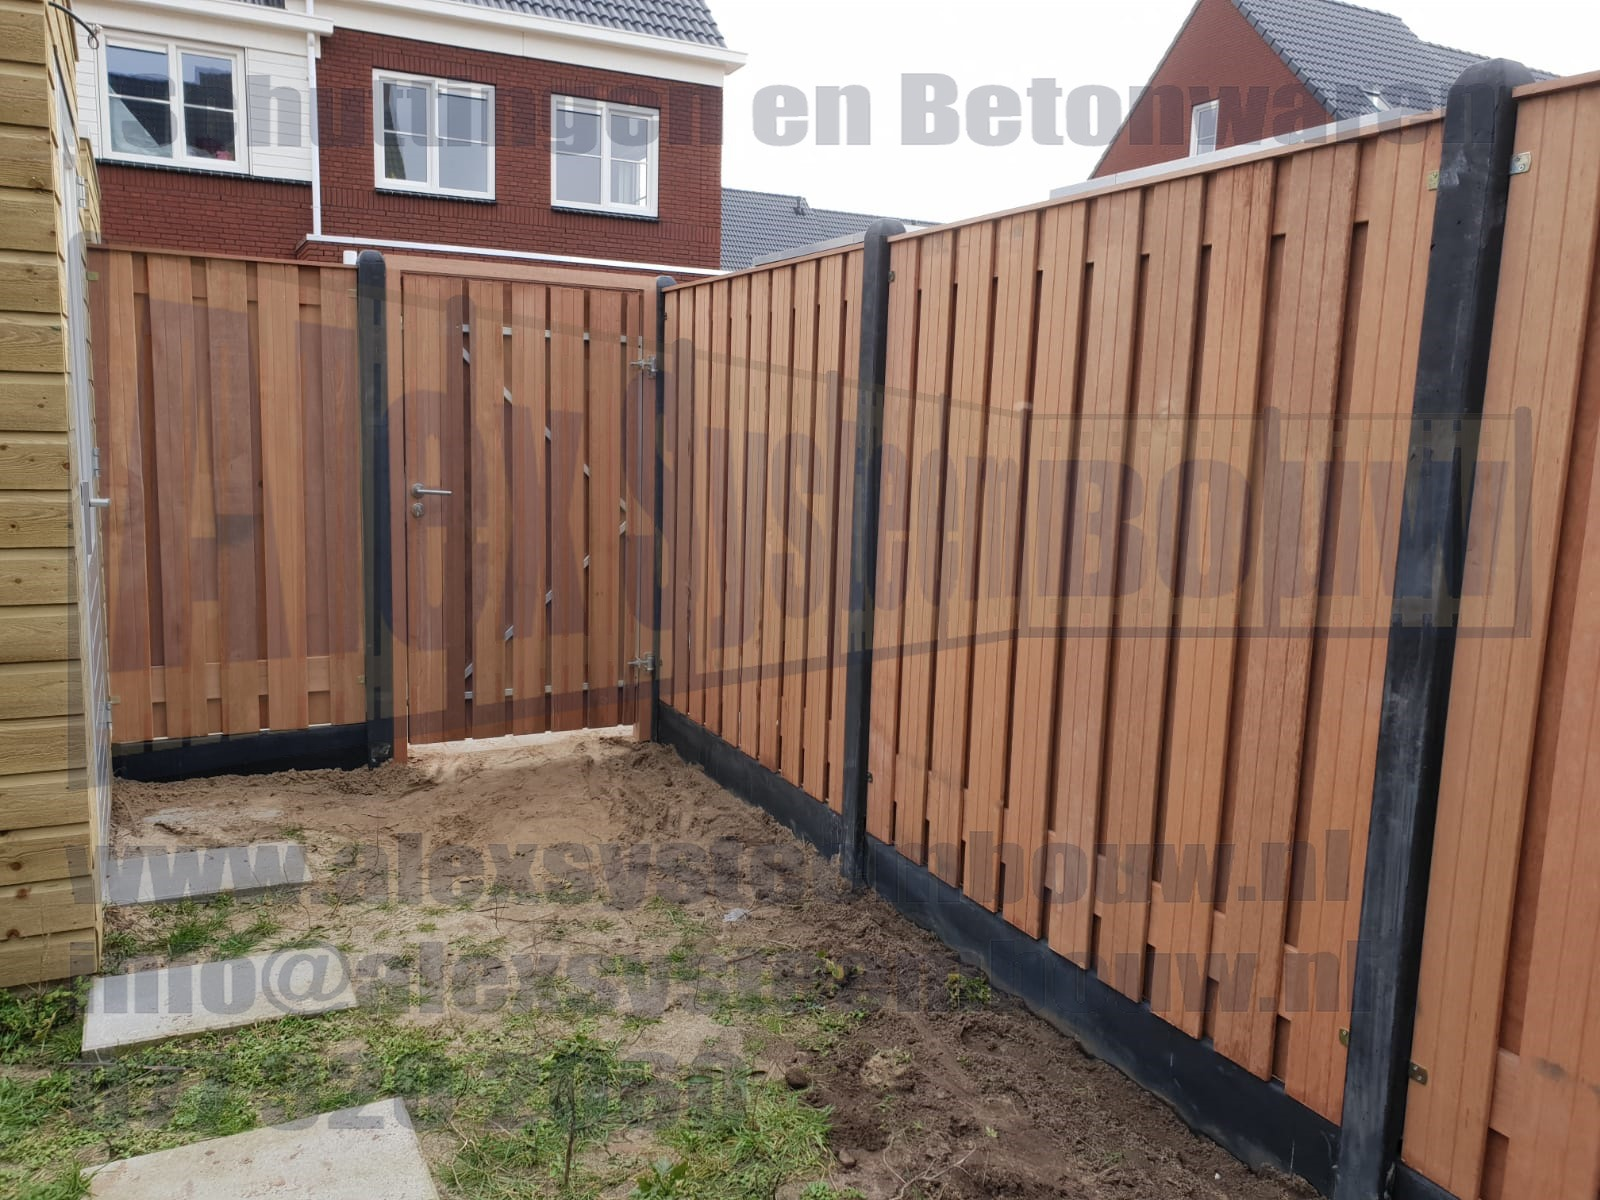 Schutting-hardhout-duurzaam-21-planks-hout-beton